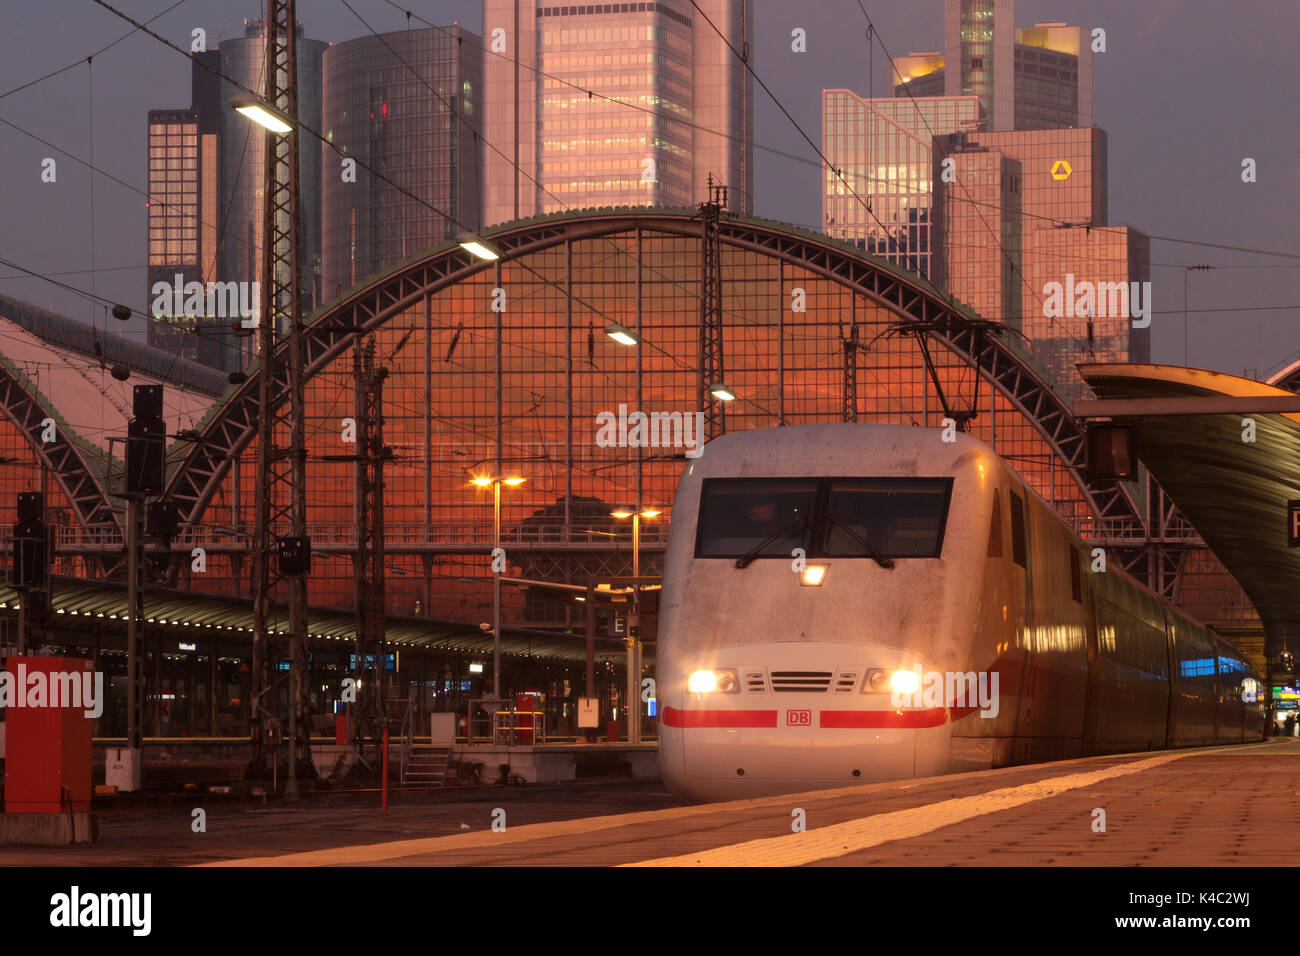 Intercity Express Ice Of Deutsche Bahn At Frankfurt Central Railway Station During Dusk - Stock Image